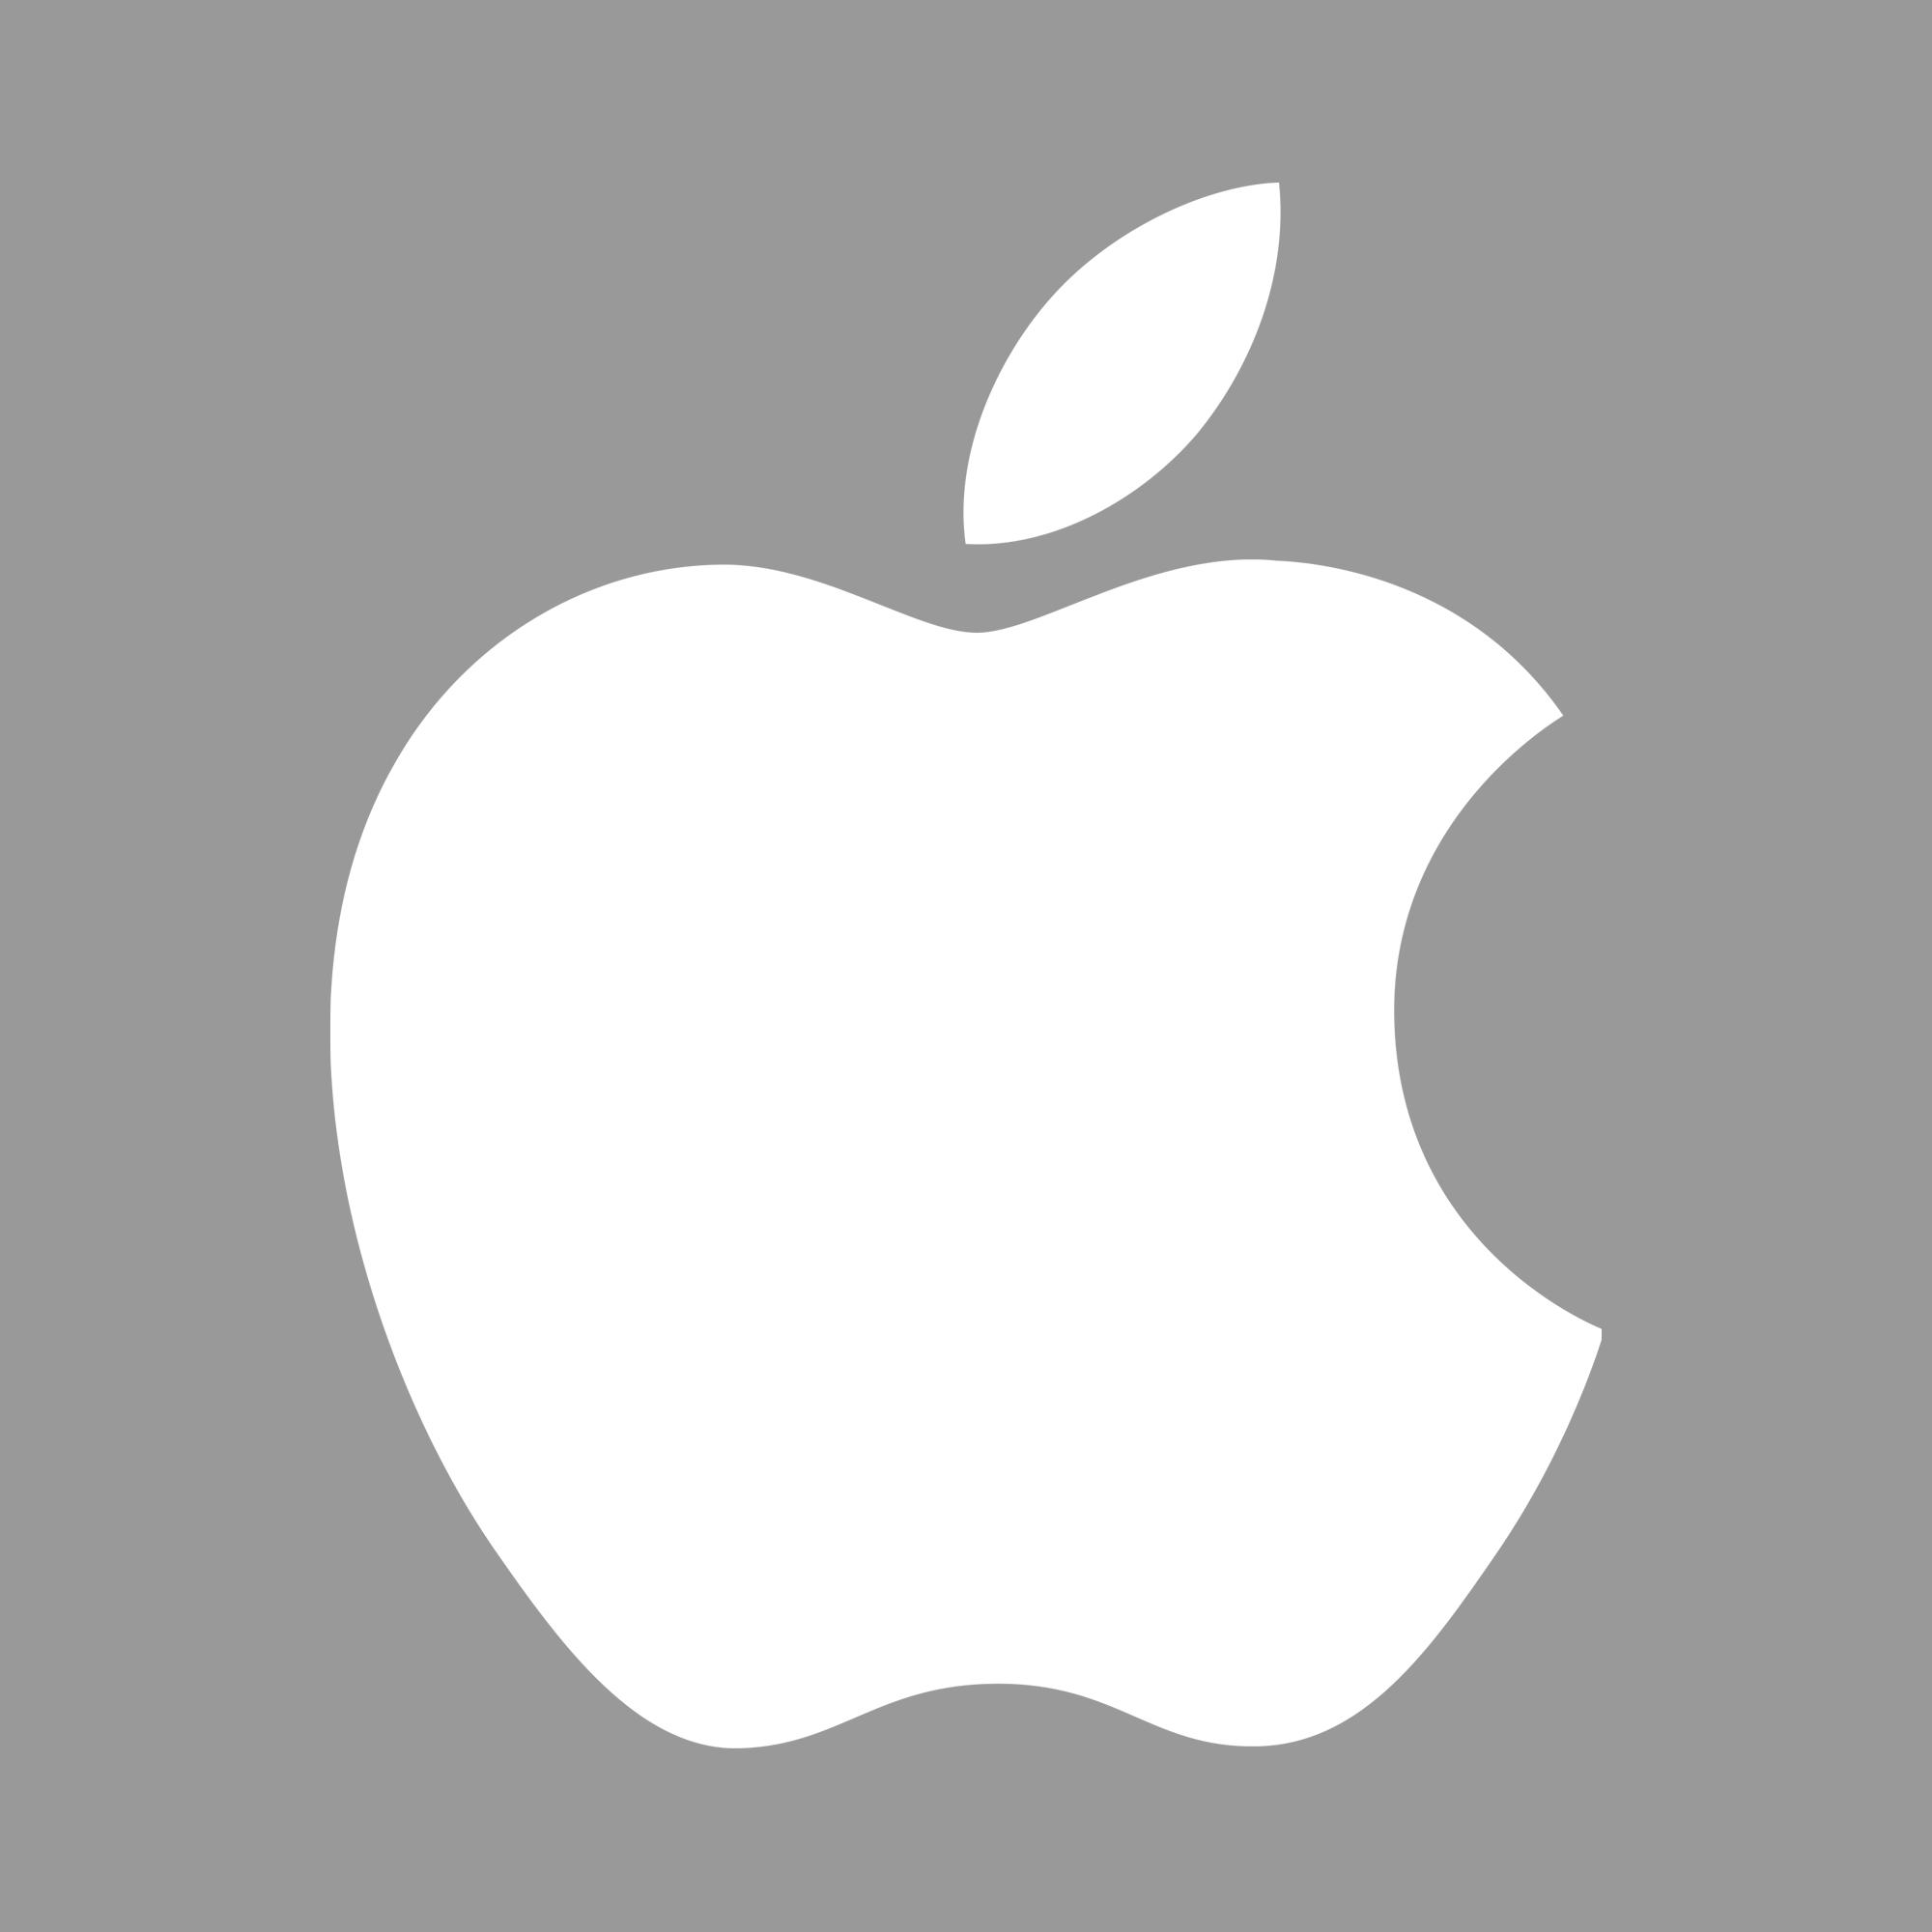 Apple_gray_logo